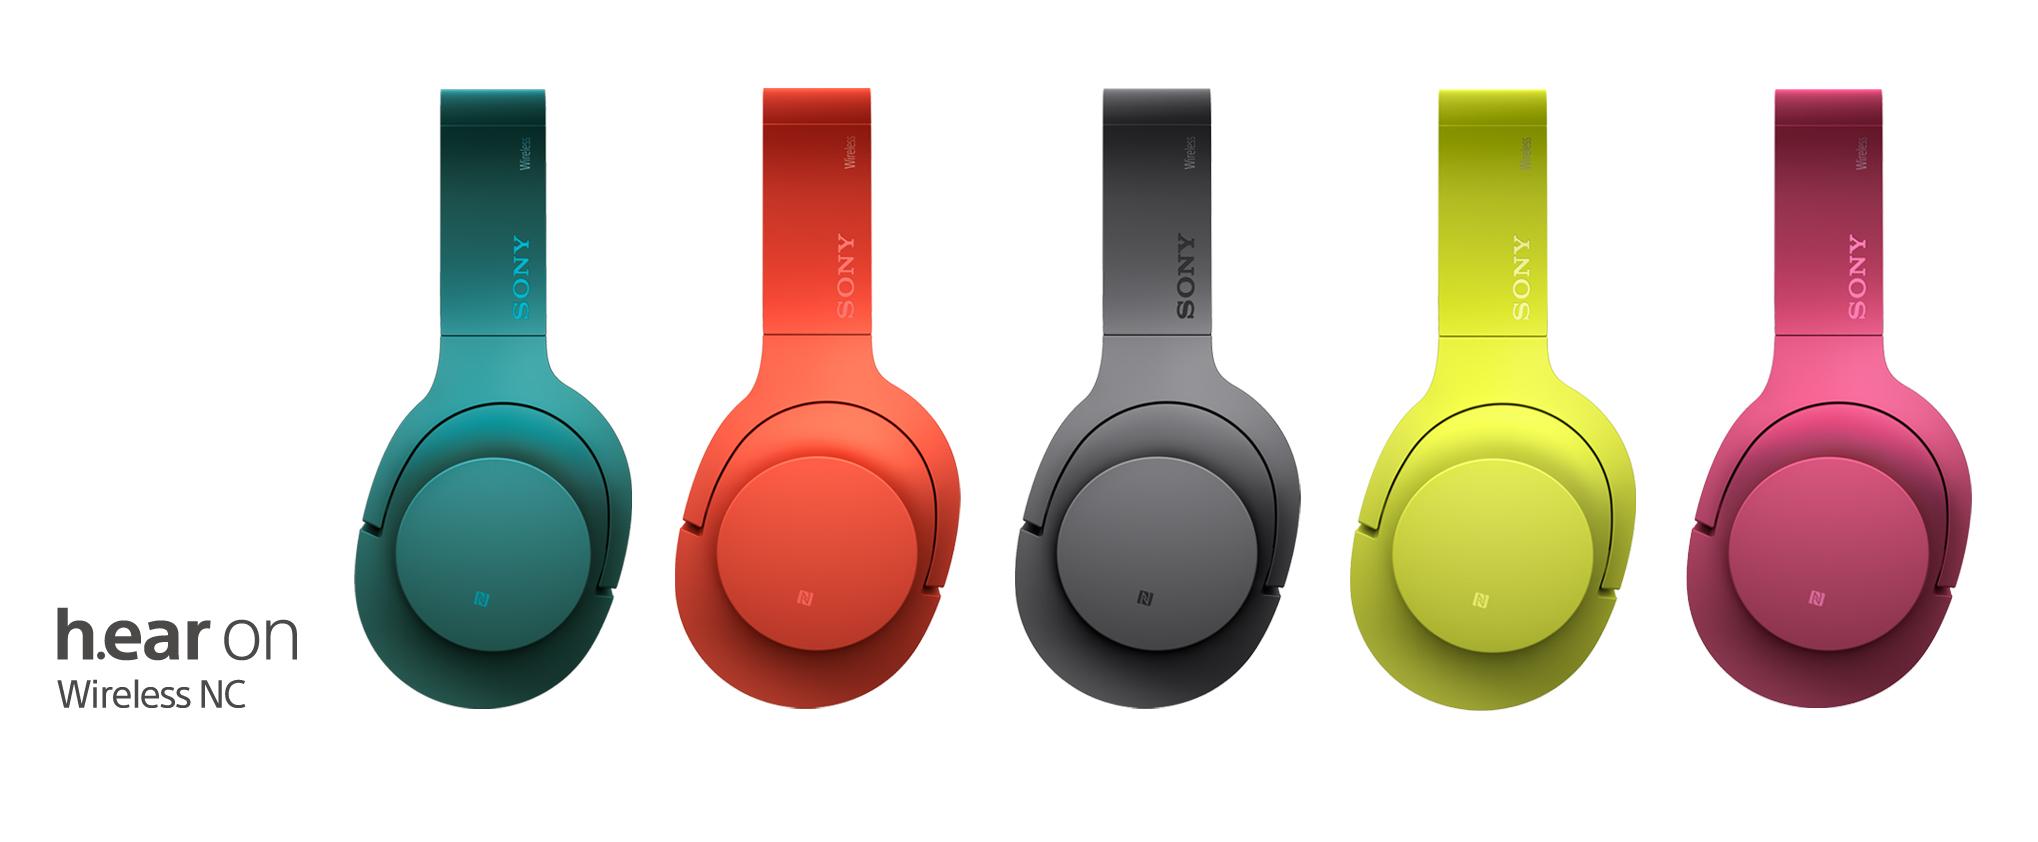 Sony Hear Mdr 100abnmdr Ex750bt 100abn